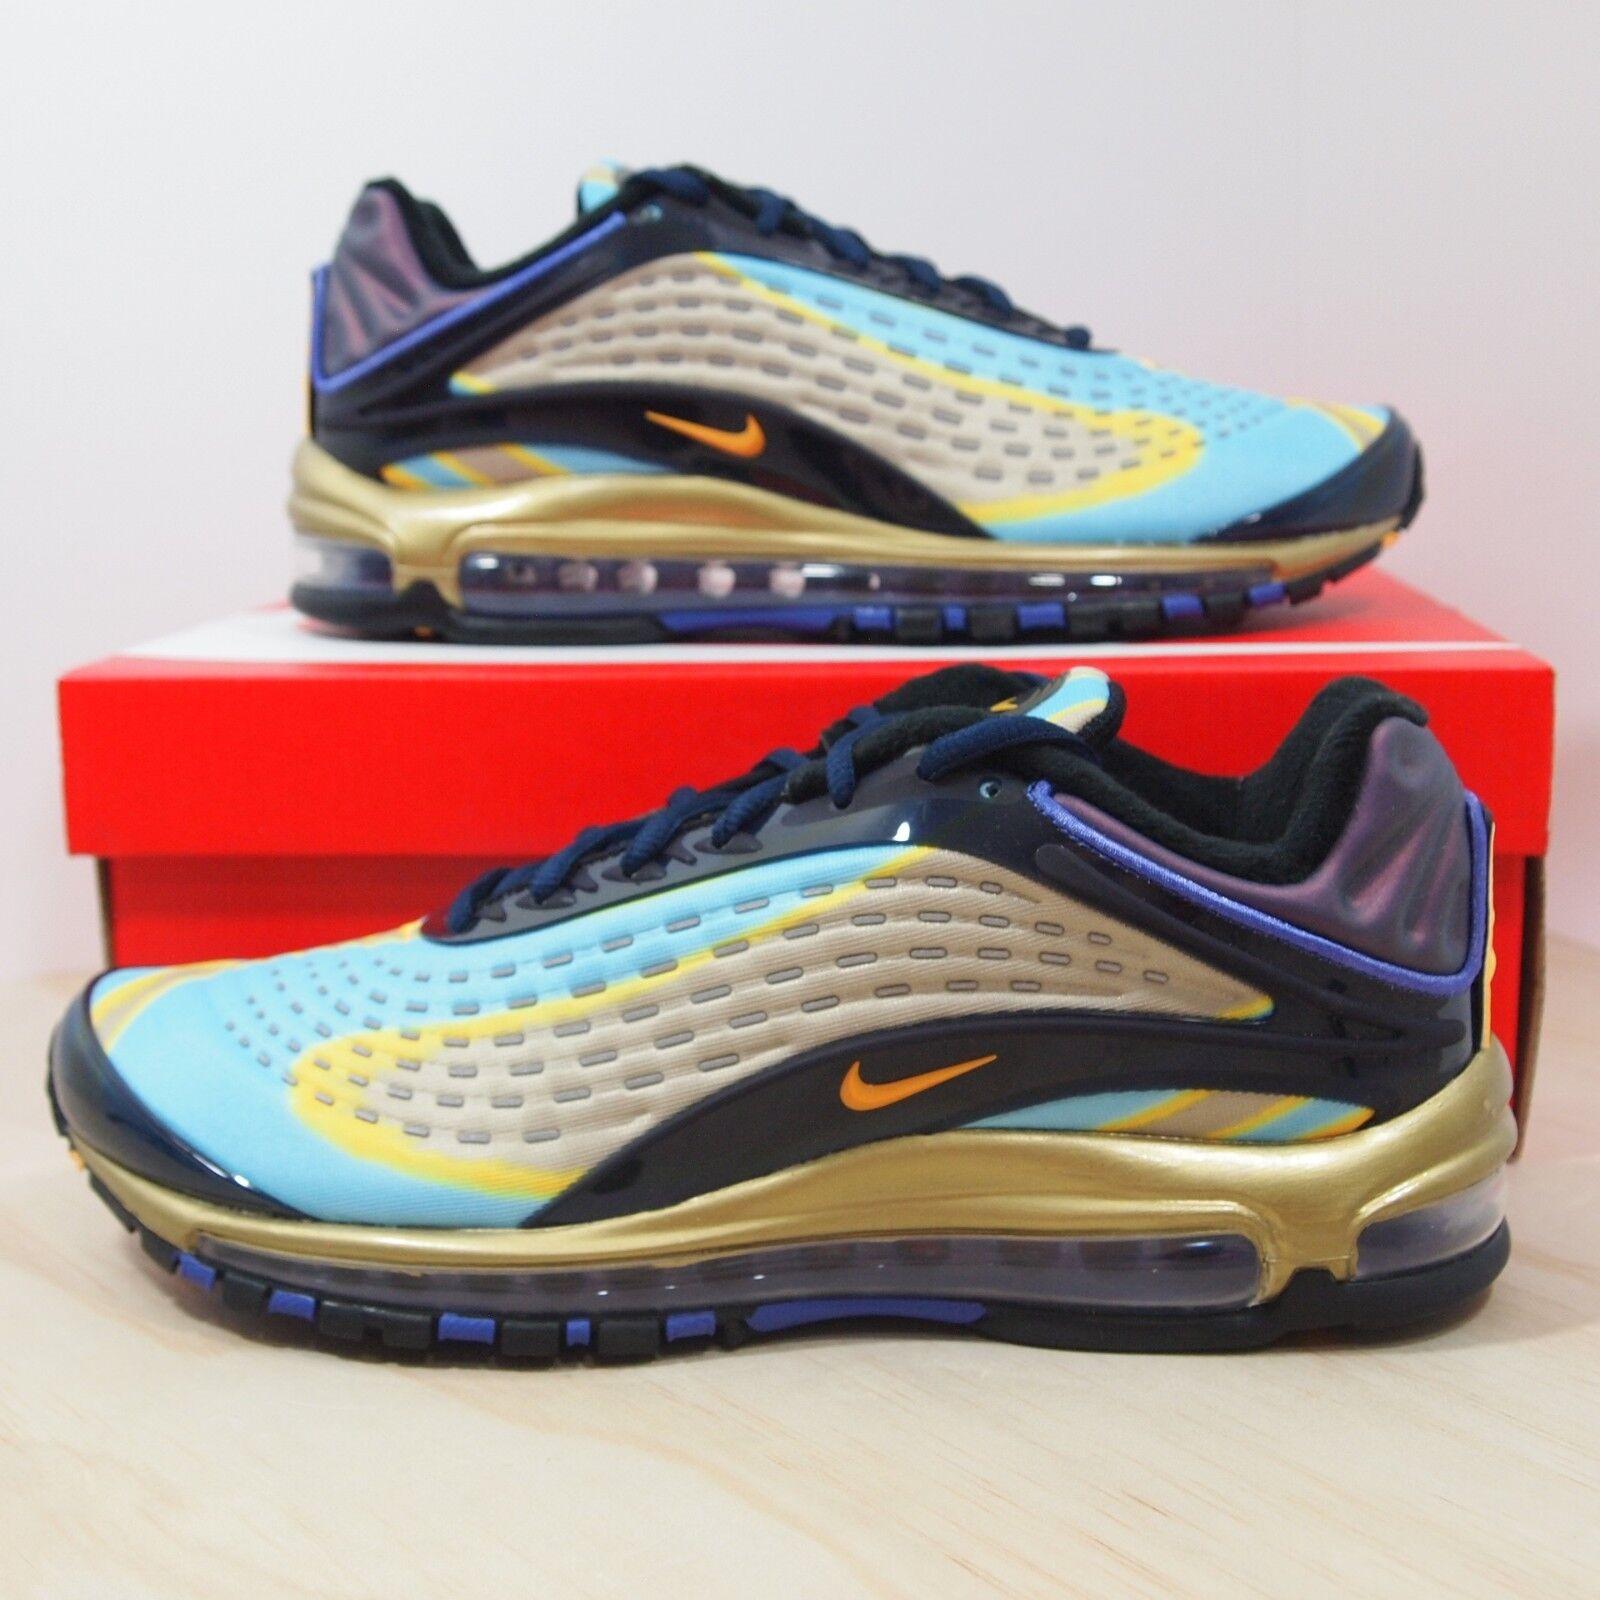 Nike Air Max Deluxe Men's Size 10.5 Midnight Navy Laser orange AJ7831-400